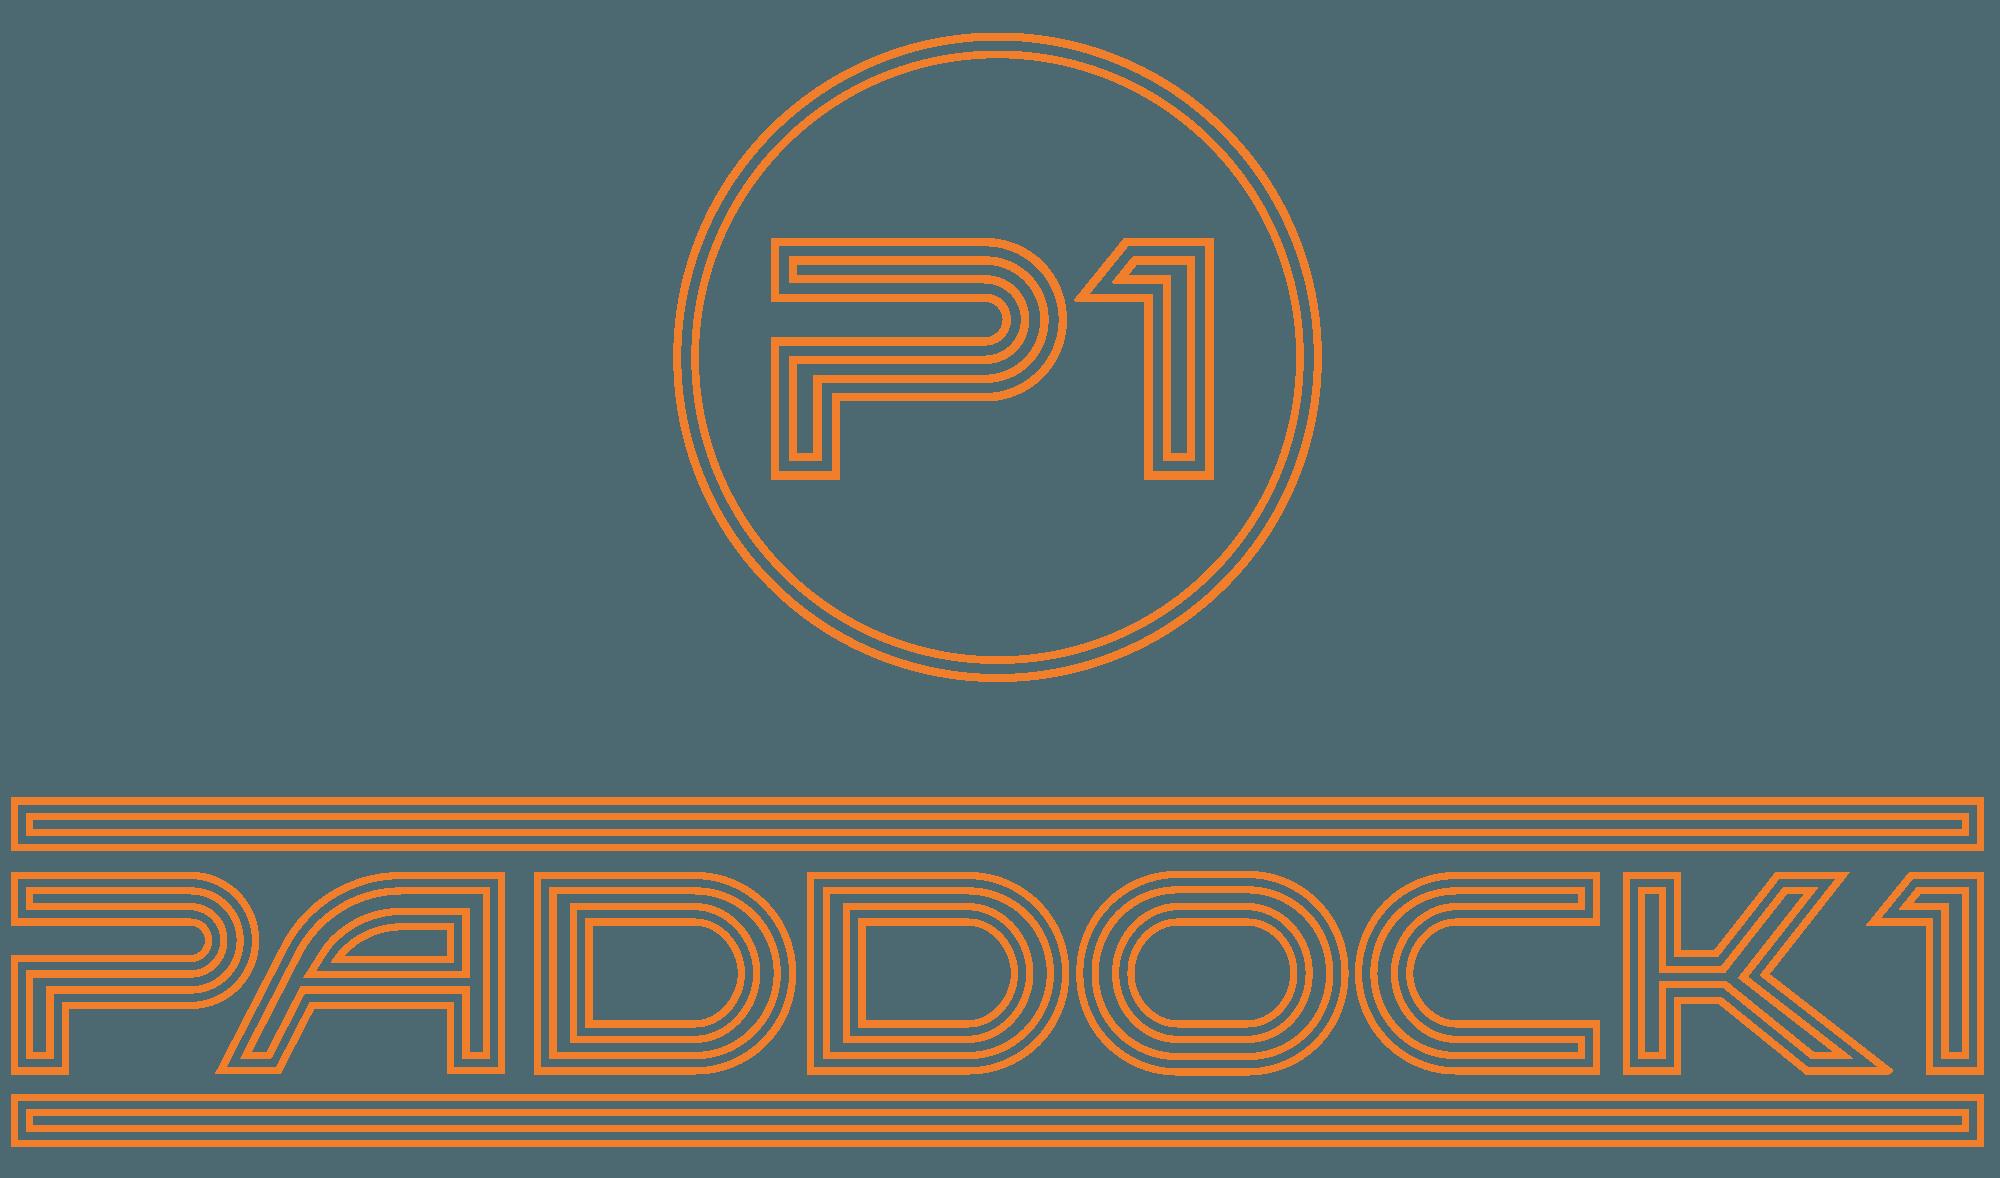 Paddock1 Premium Garage Condos